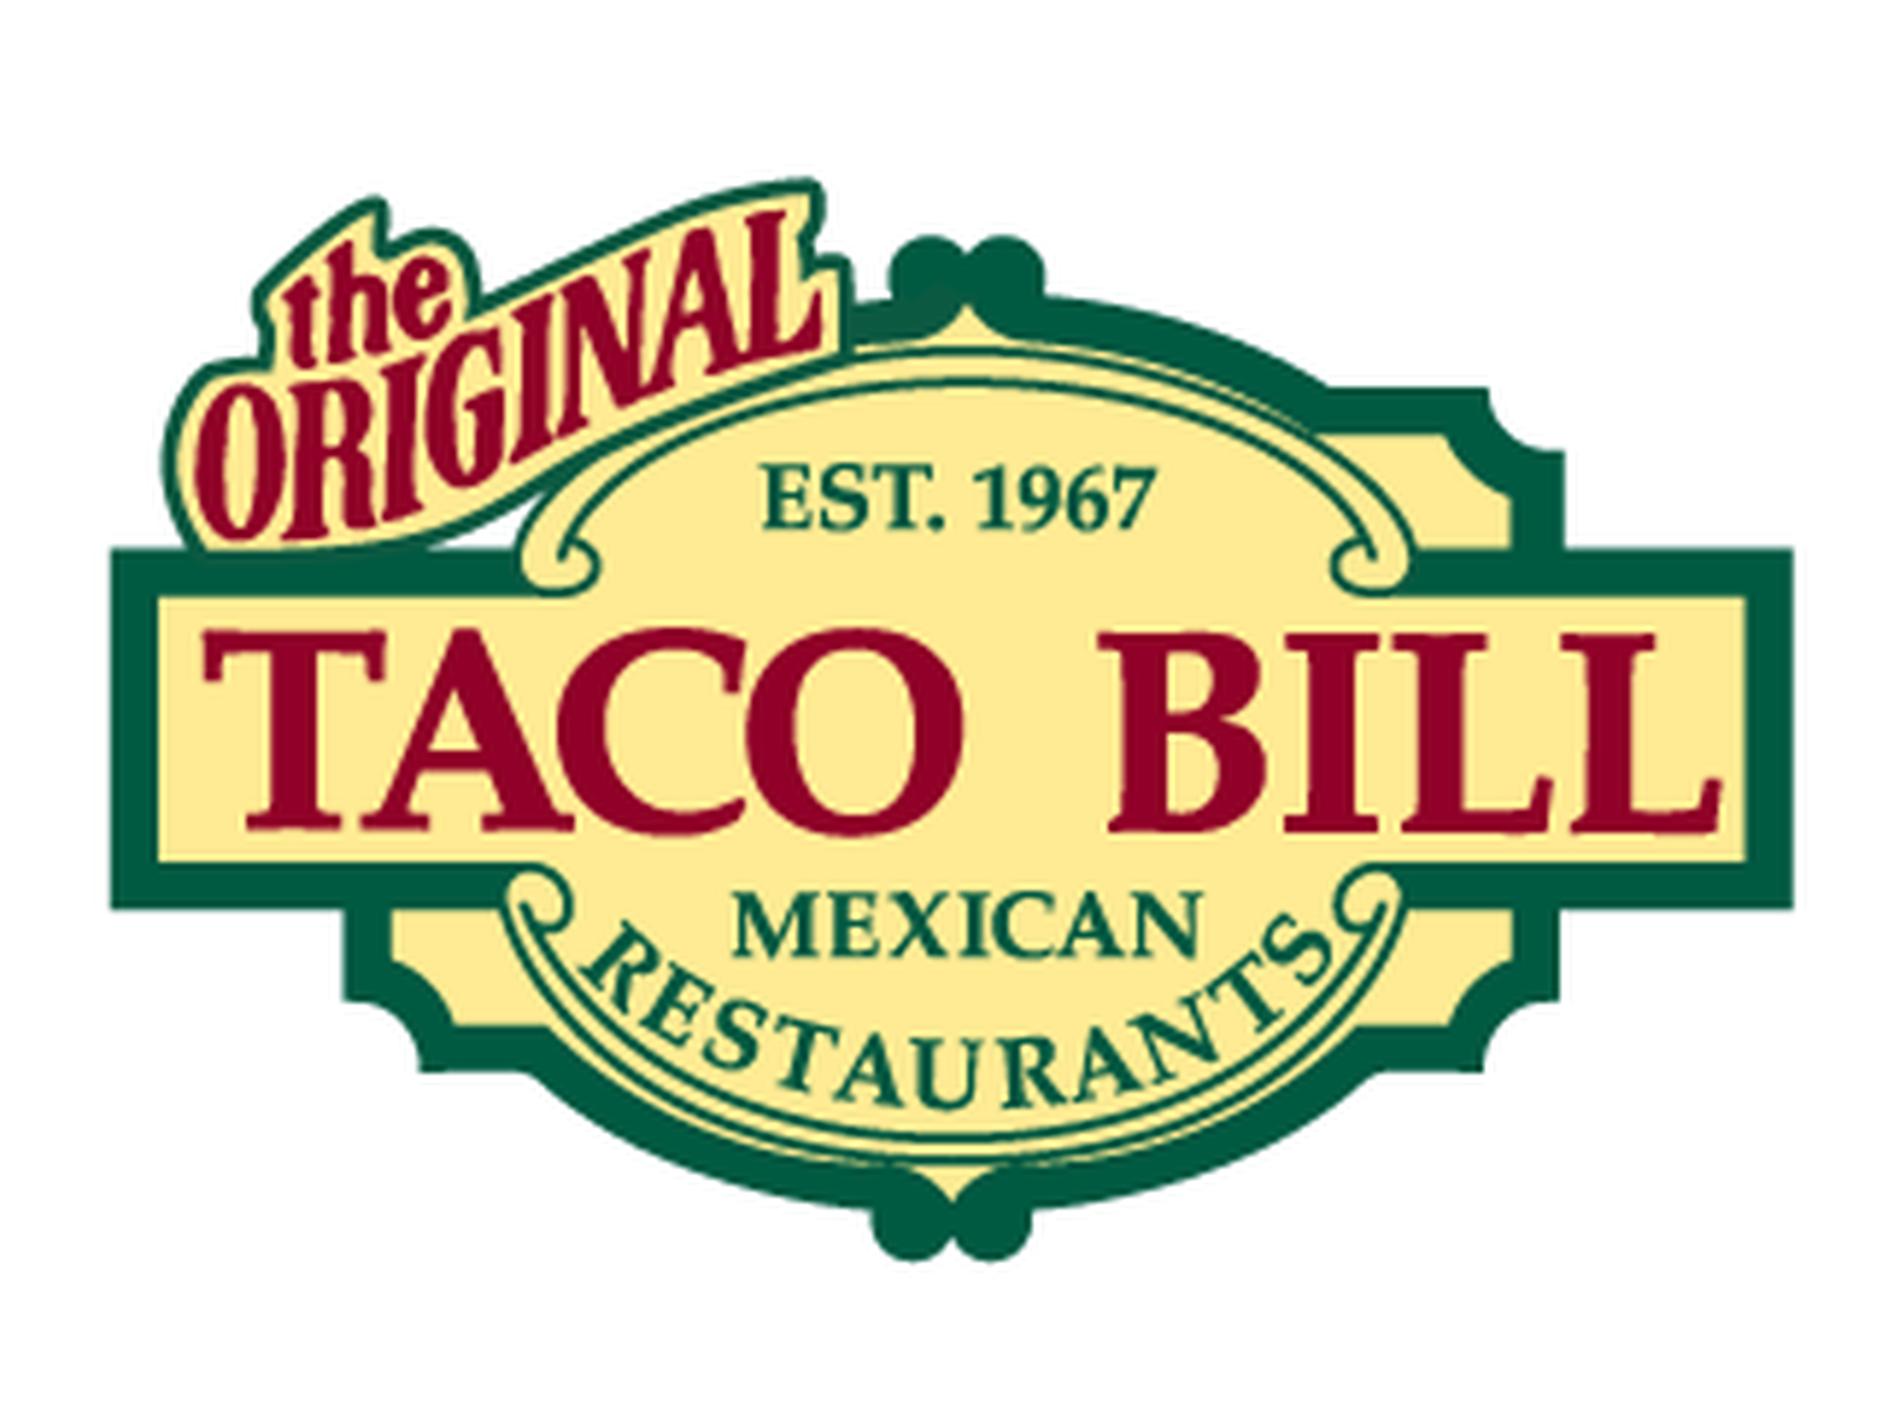 Taco Bill Franchise Restaurant Business for Sale